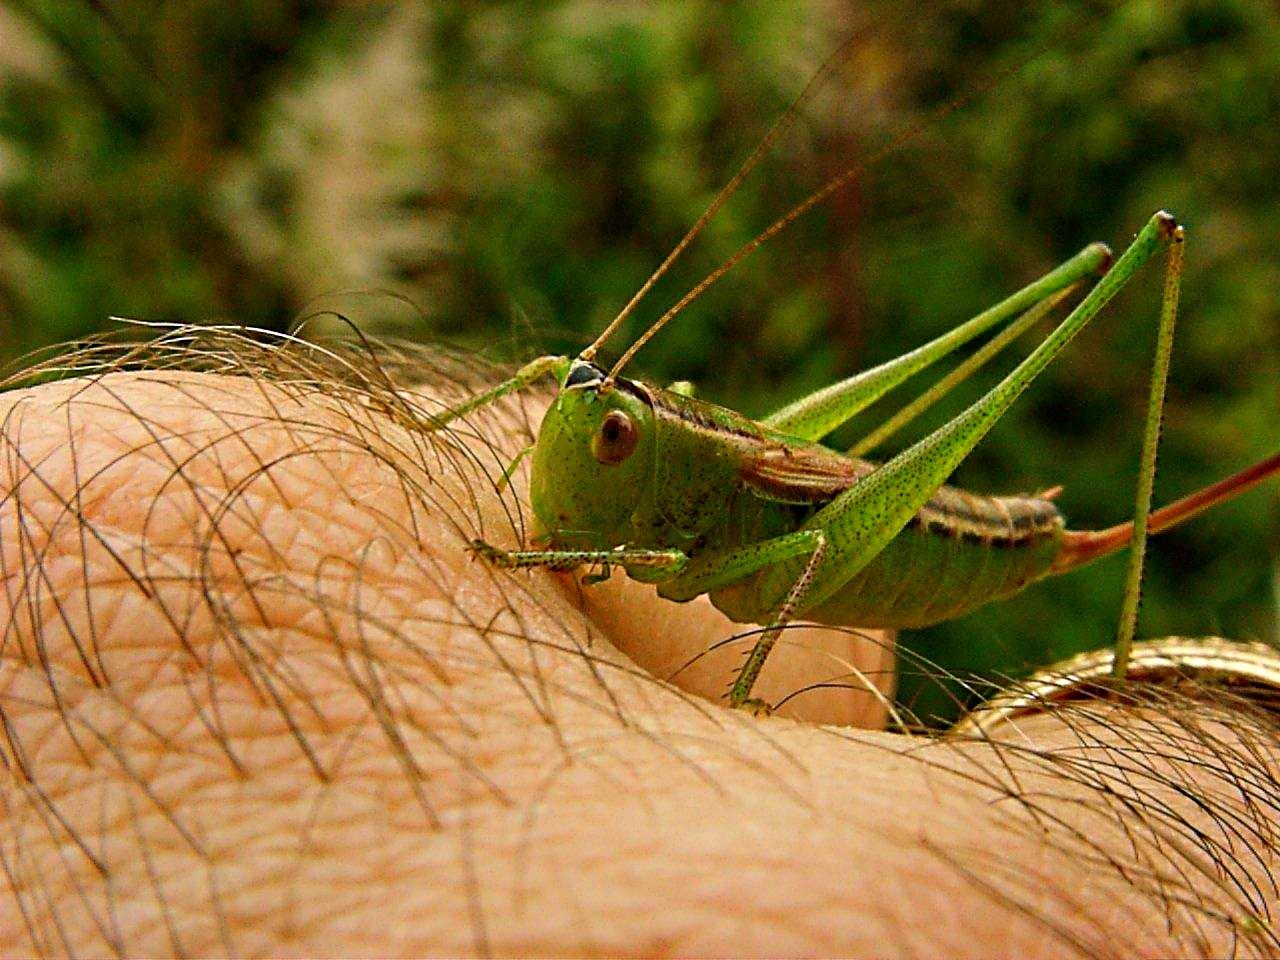 Visiting Katydid (insects)... photo by Thomas Peace 2014